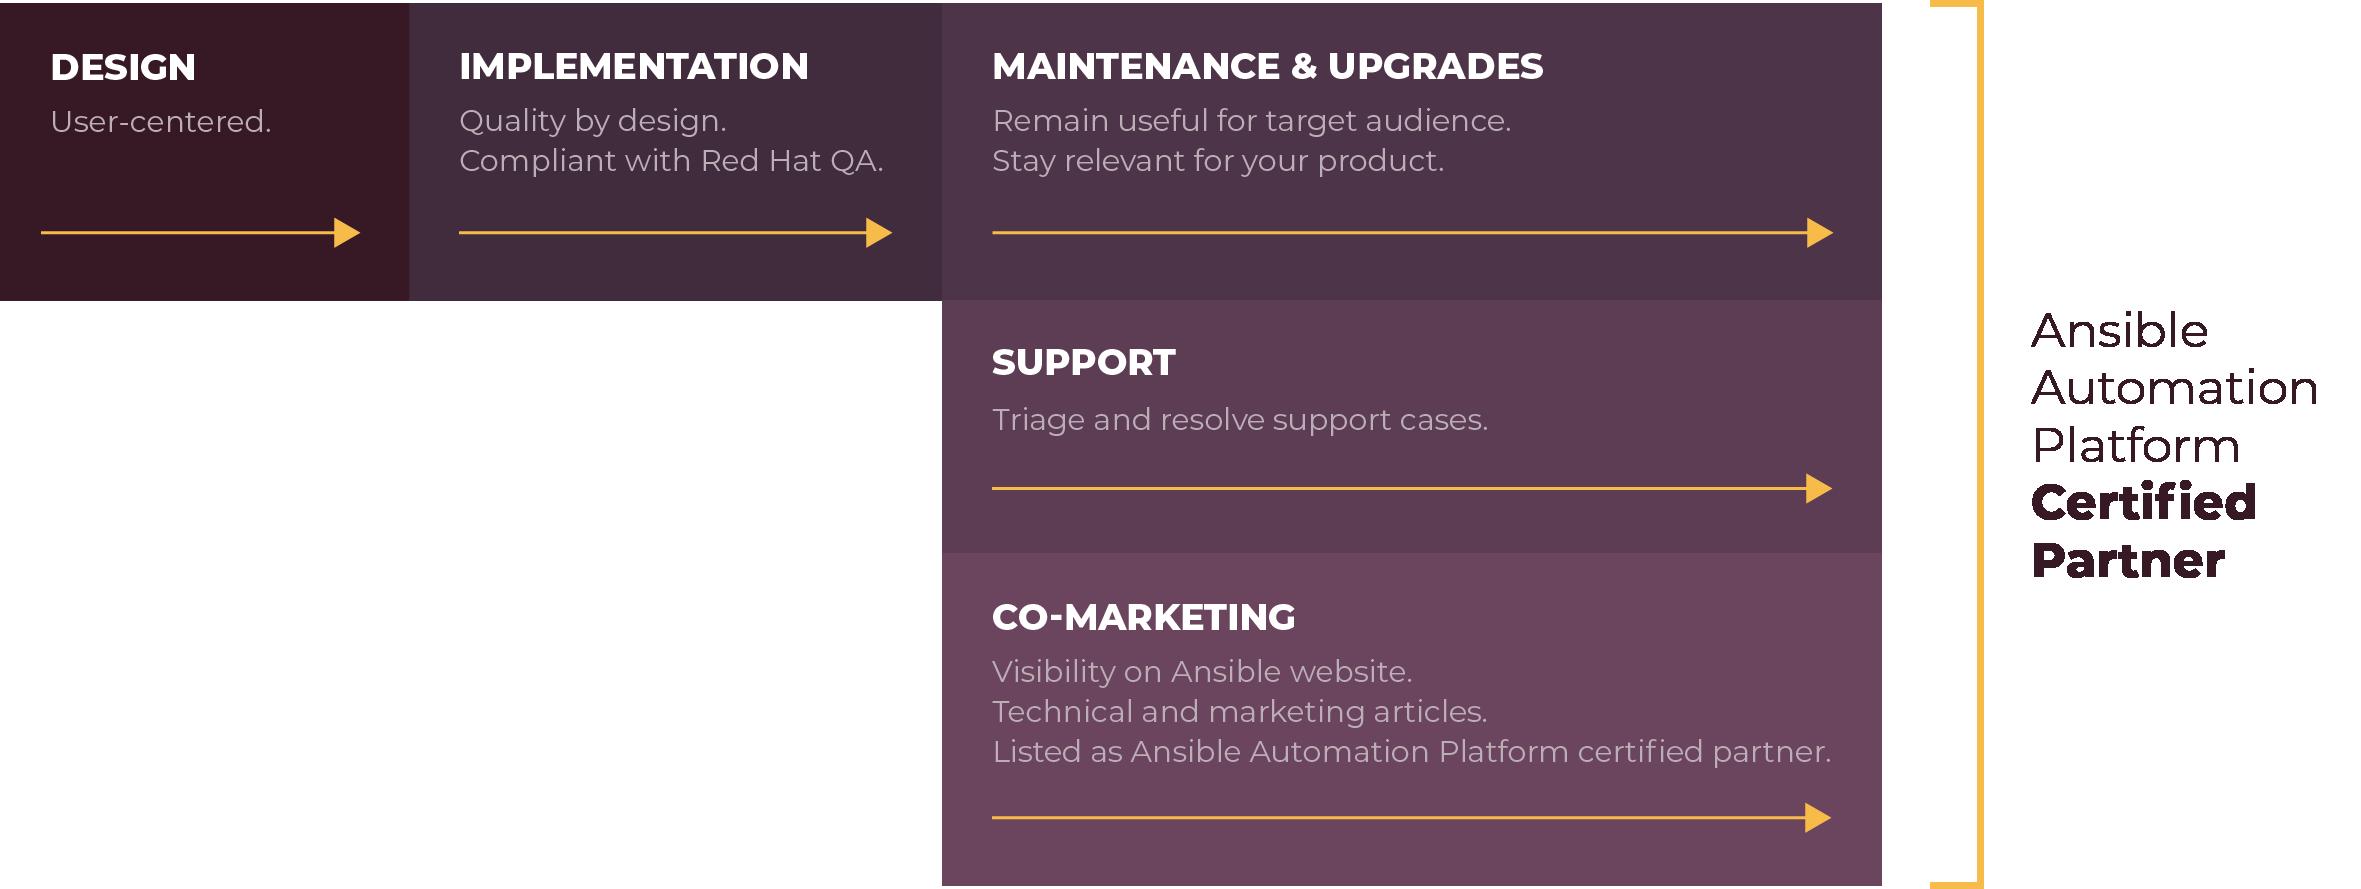 Ansible Automation Platform Certification process